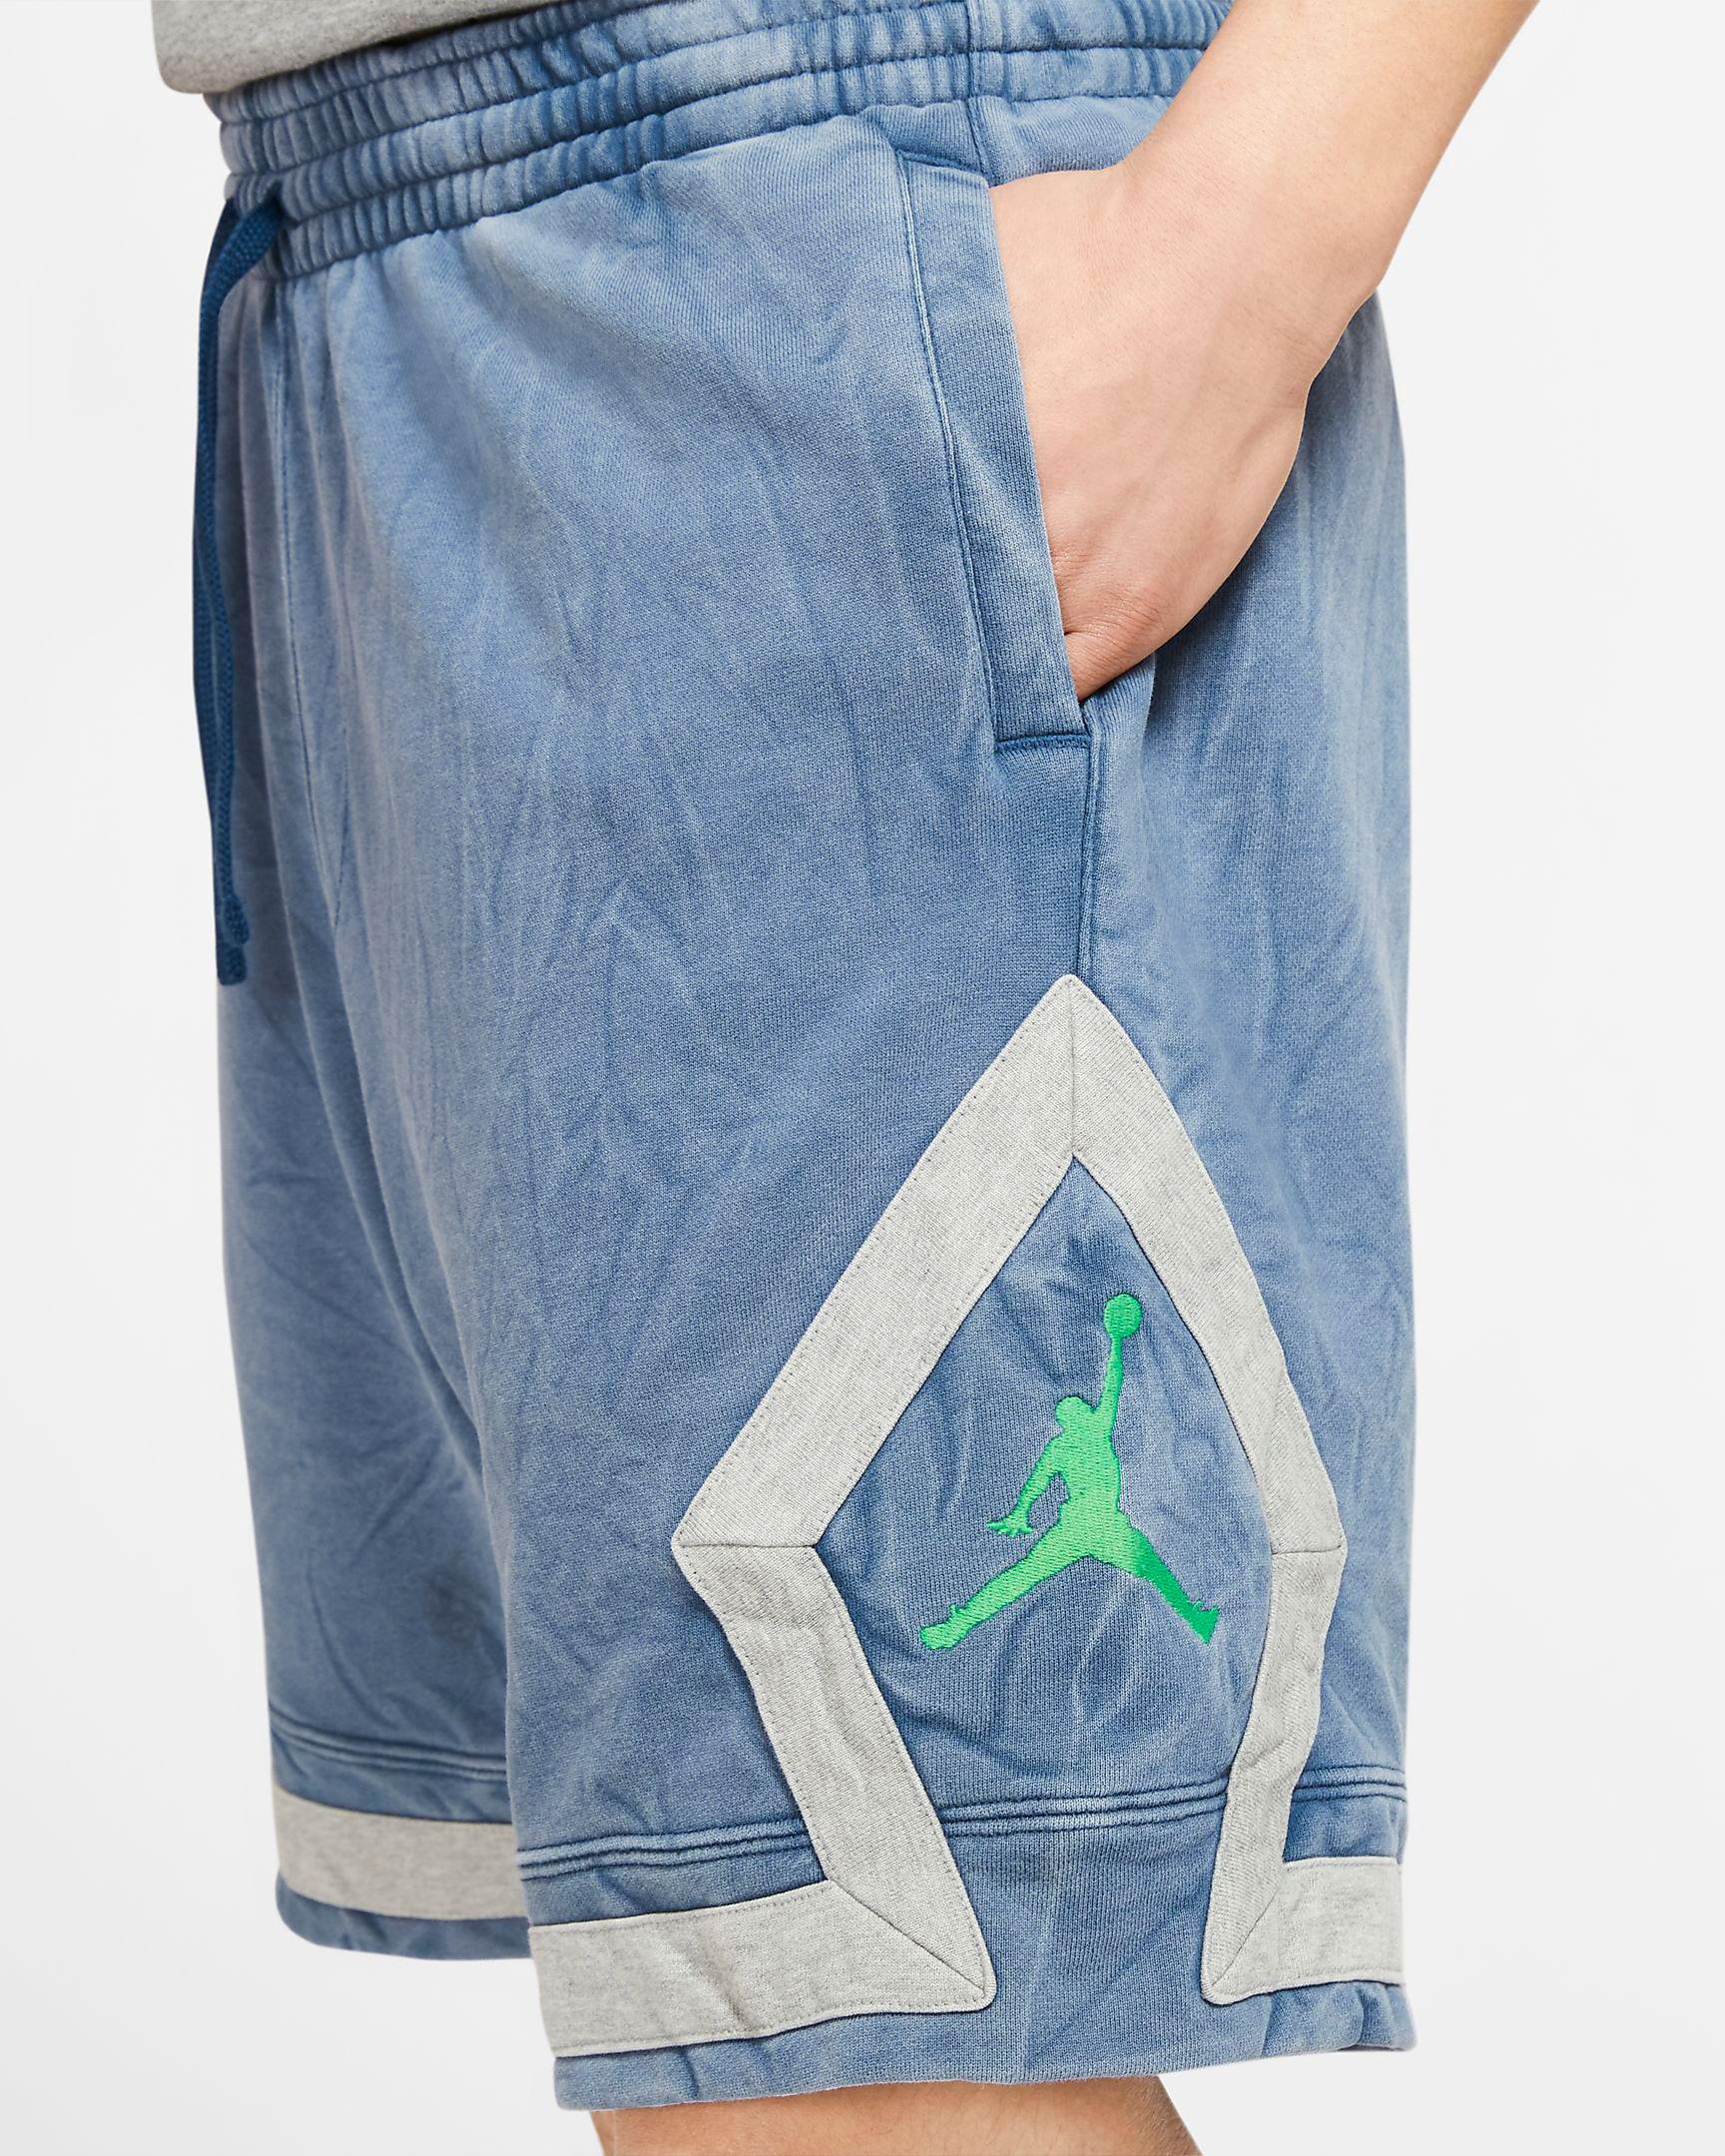 jordan-12-indigo-stone-blue-shorts-match-2